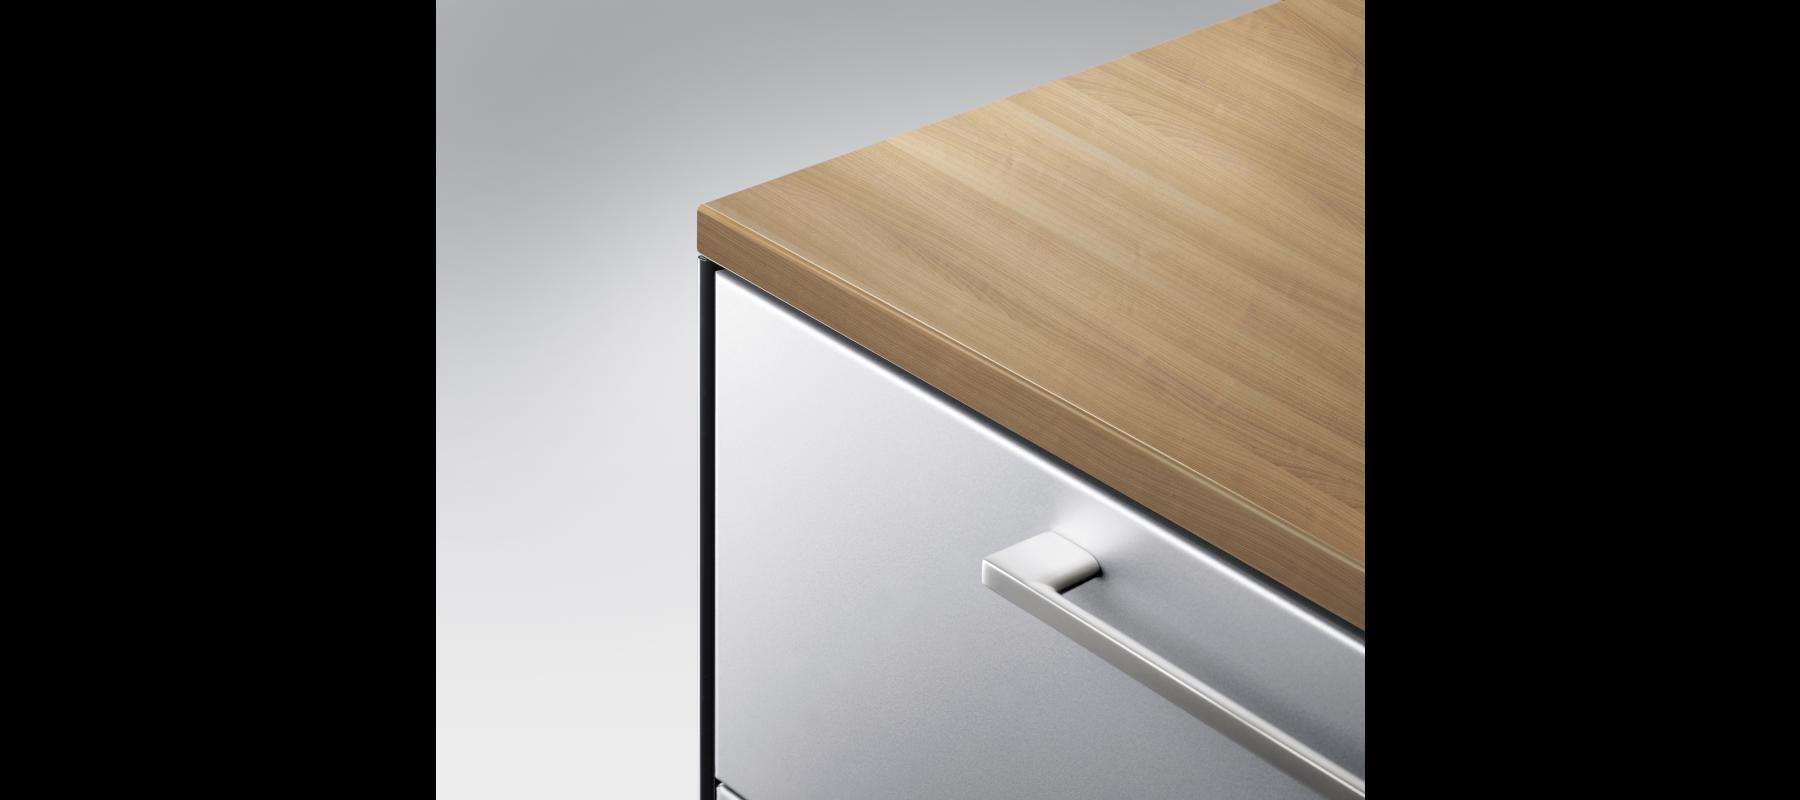 metalowe meble biurowe szafy szufladowe cp detale - 04